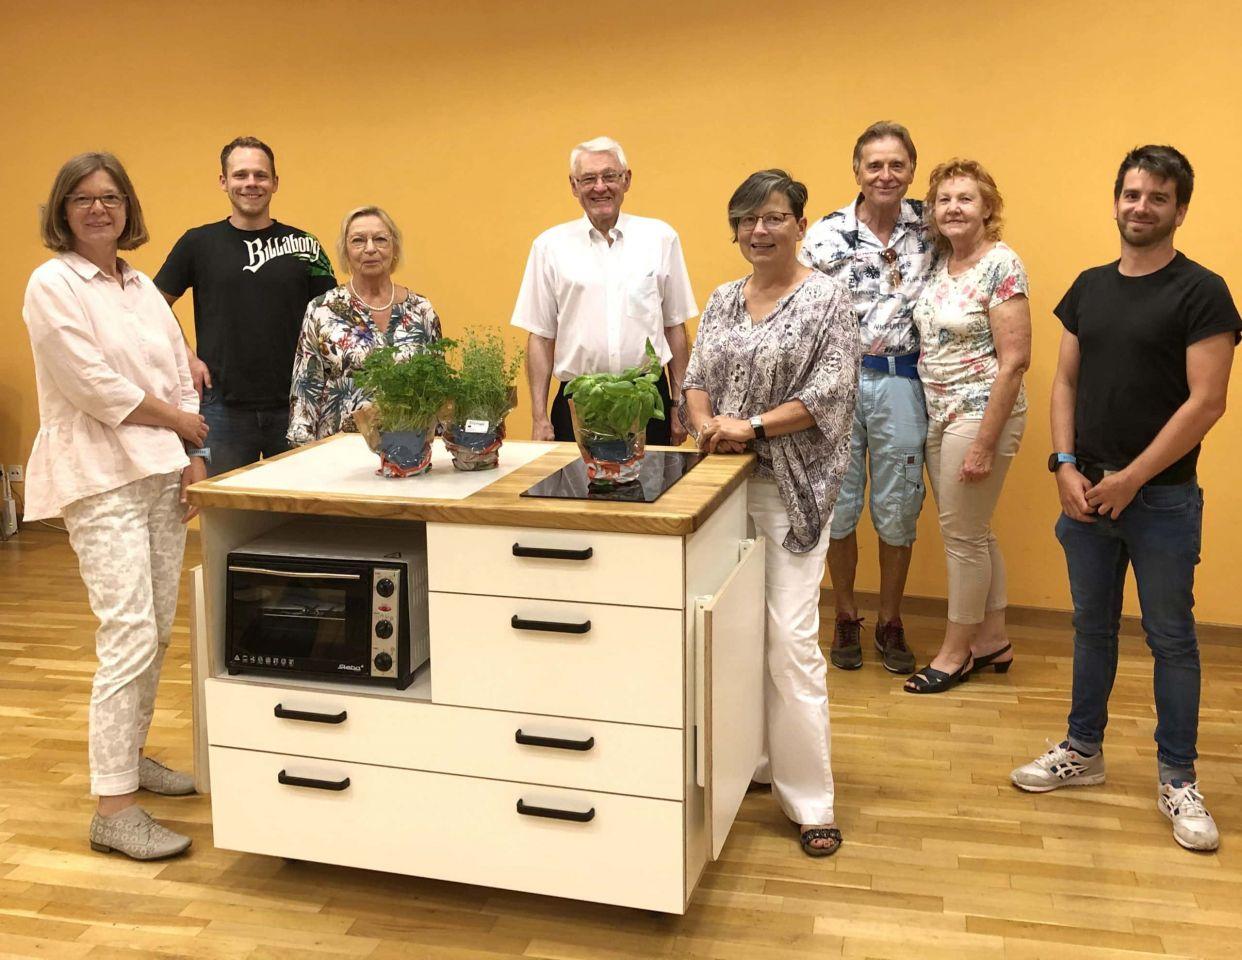 Mobile Kochstation: AWO Würzburg gibt 3.400 Euro